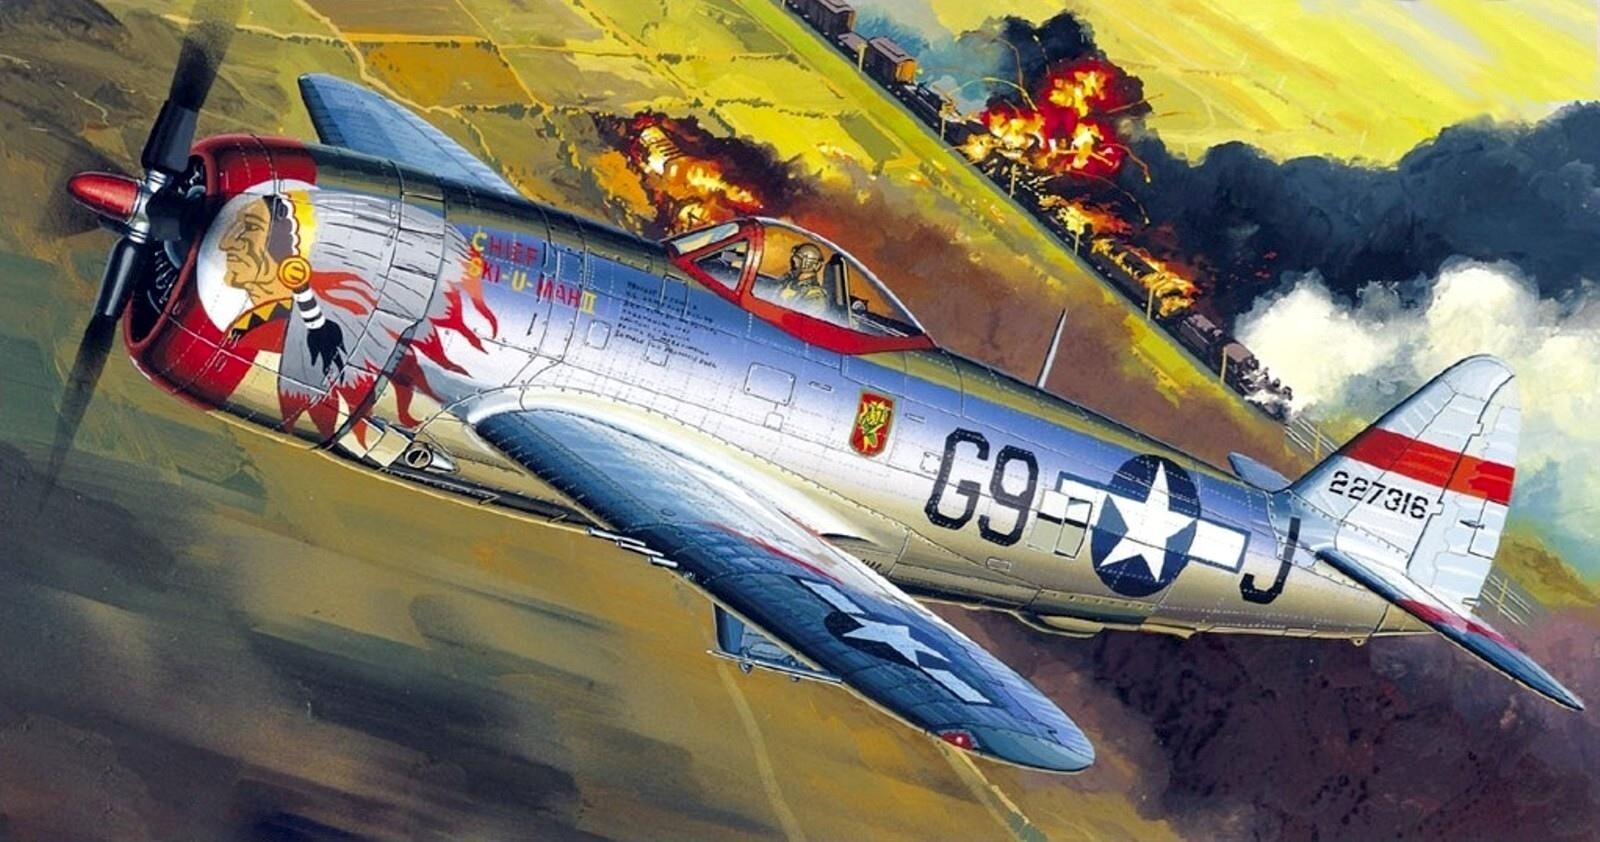 Republic P-47 Thunderbolt wallpapers HD quality